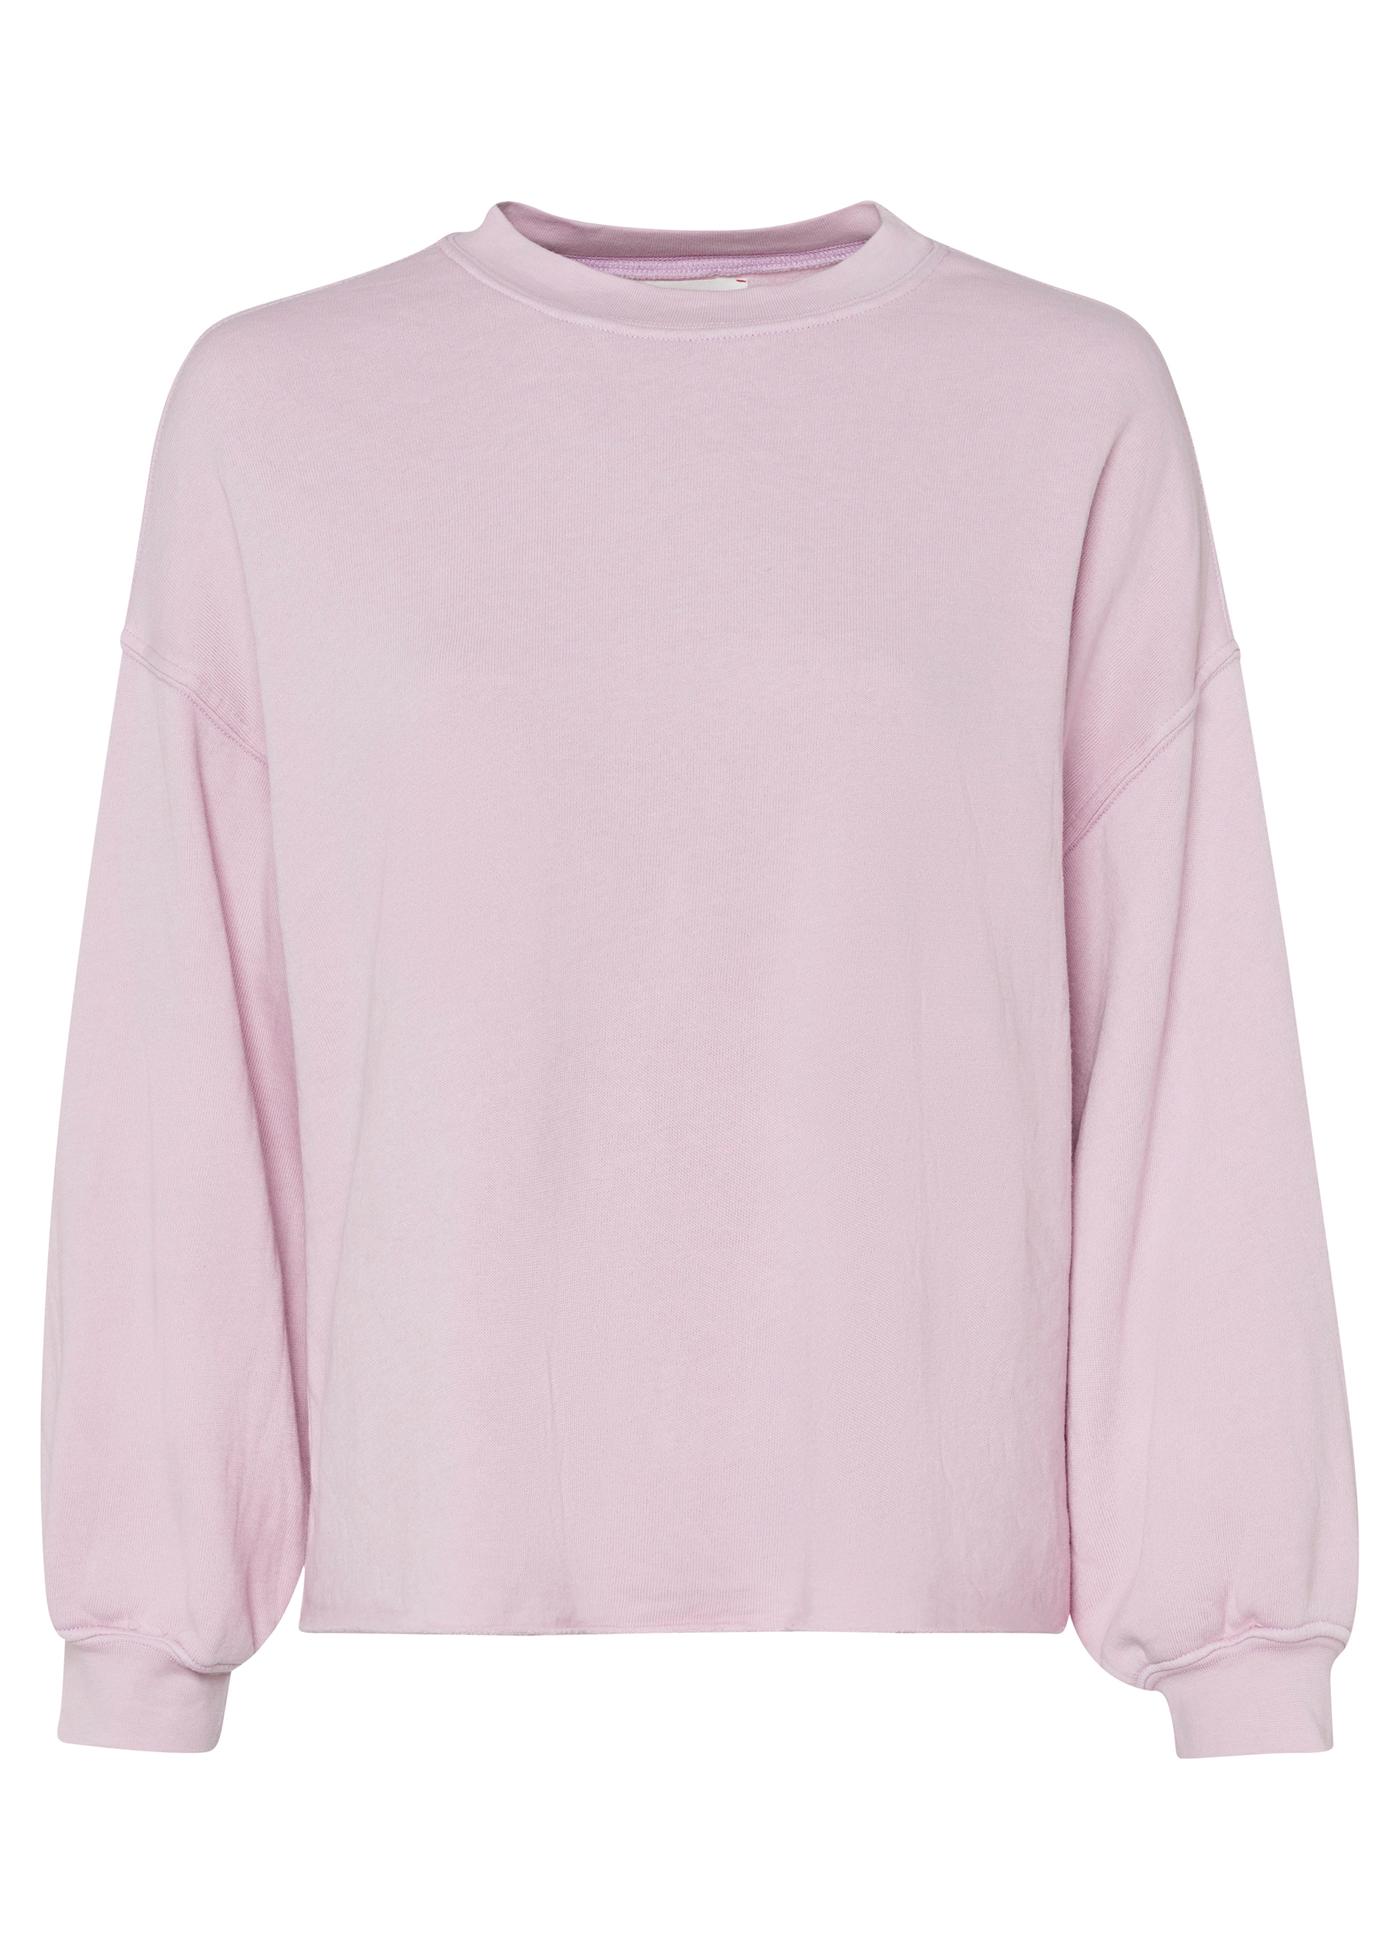 Honor Sweatshirt image number 0